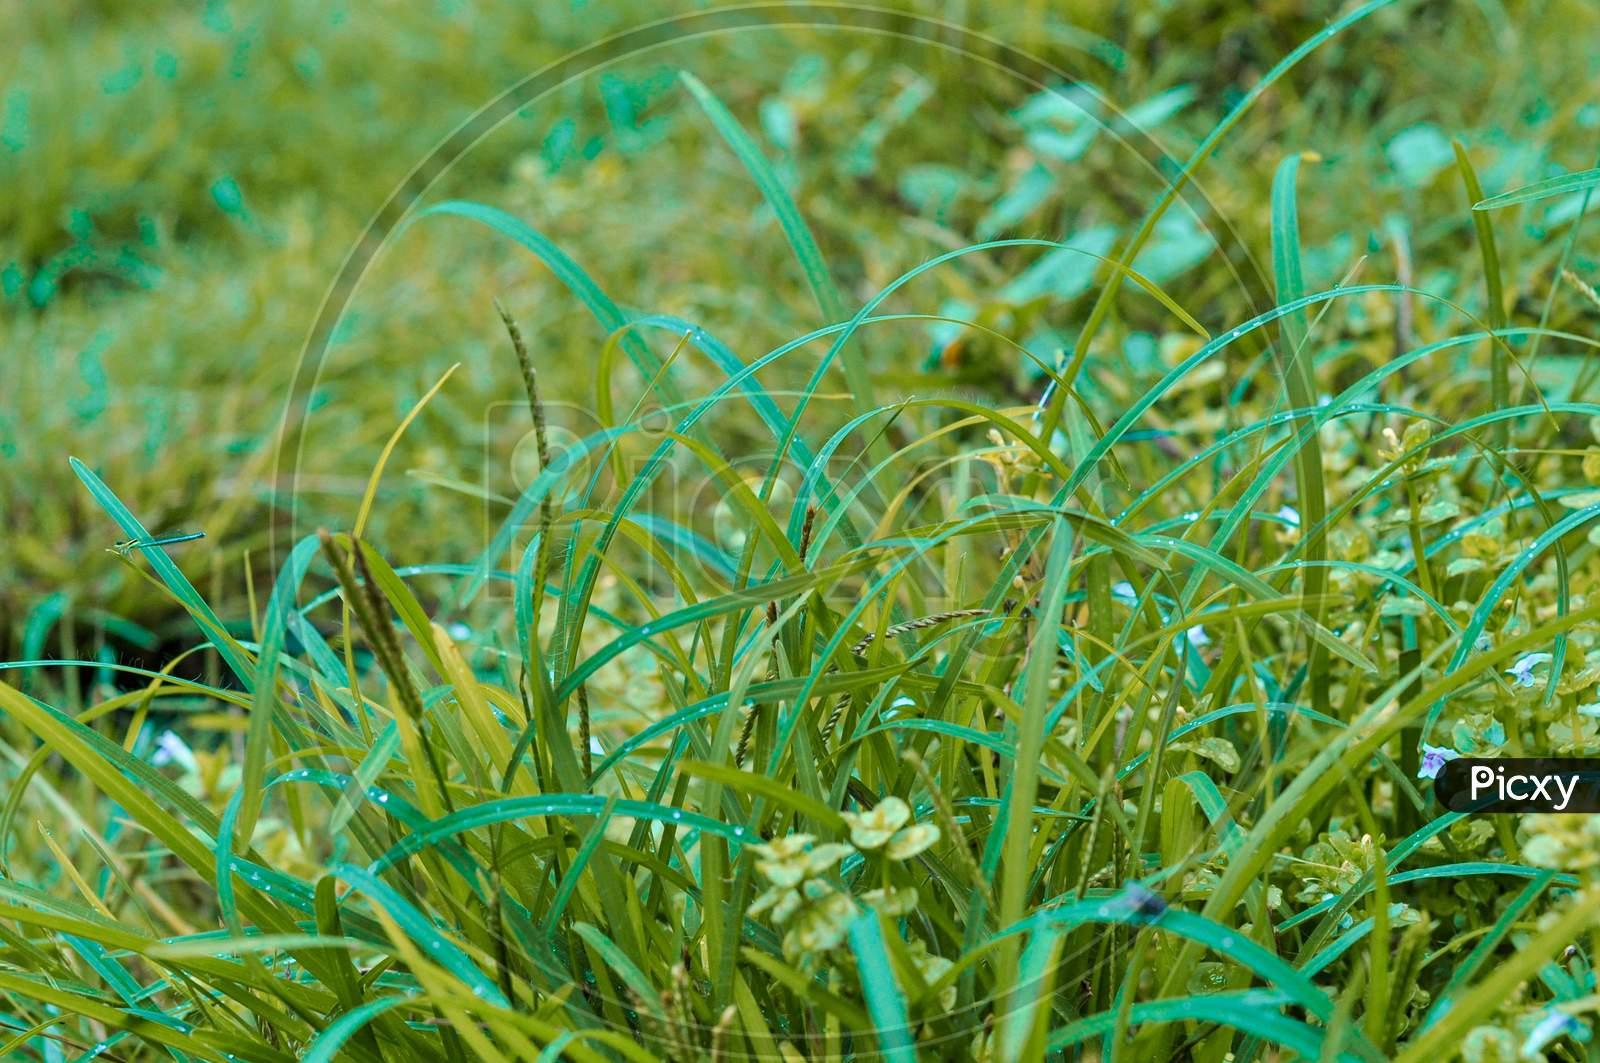 Greene Grass Background Wallpaper Image